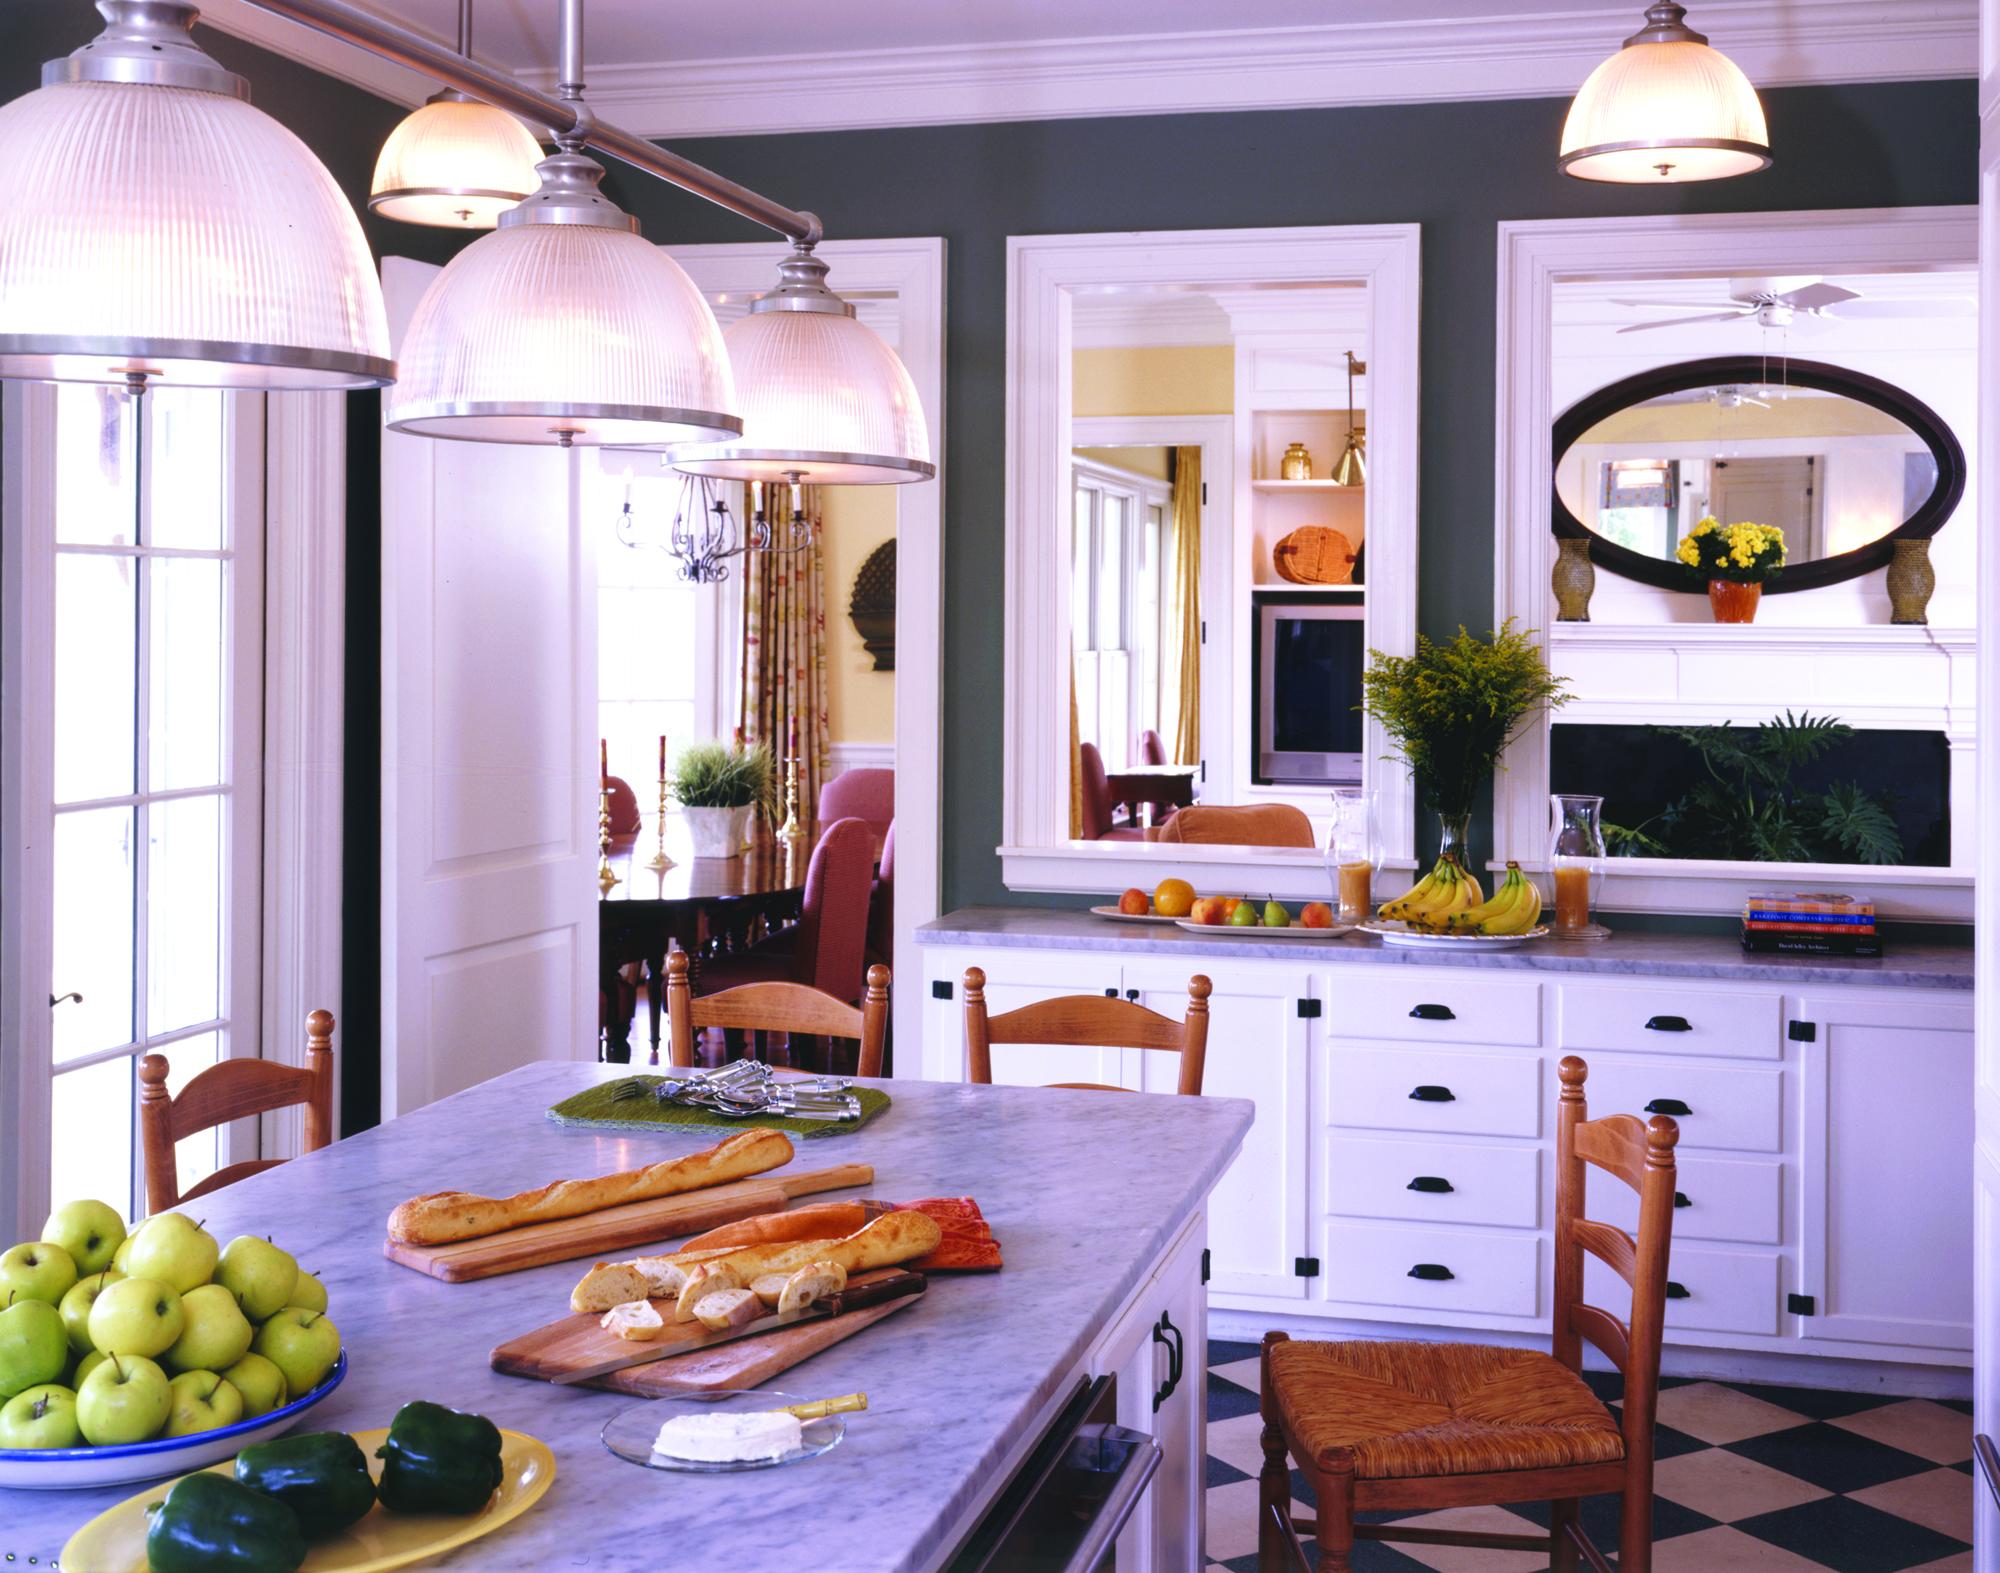 ll-web-sullivans-island-kitchen-1.jpg